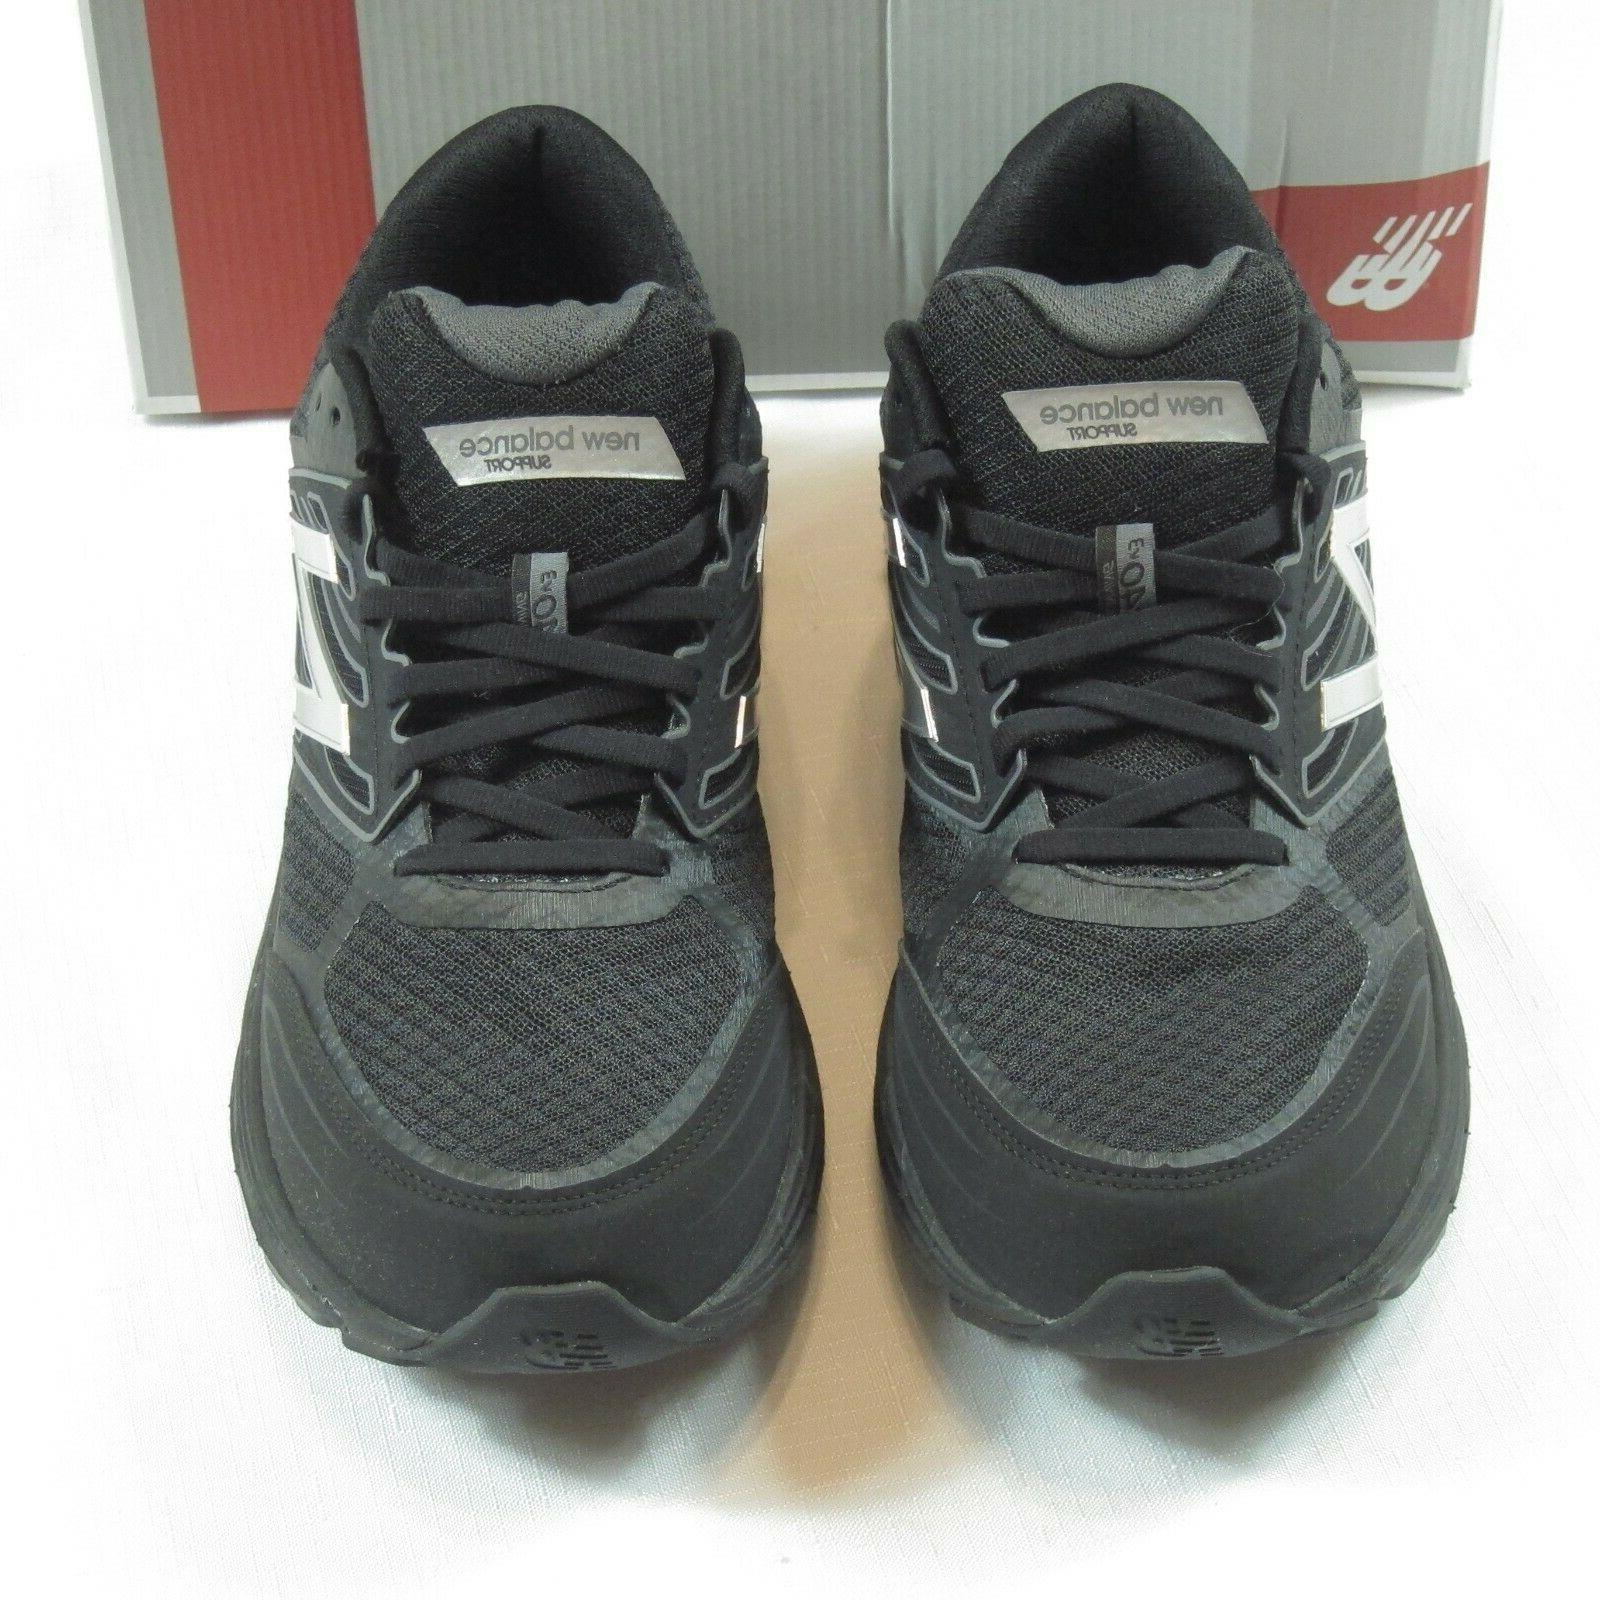 New Balance 1340v3 Sneakers Mens Grey NEW $140